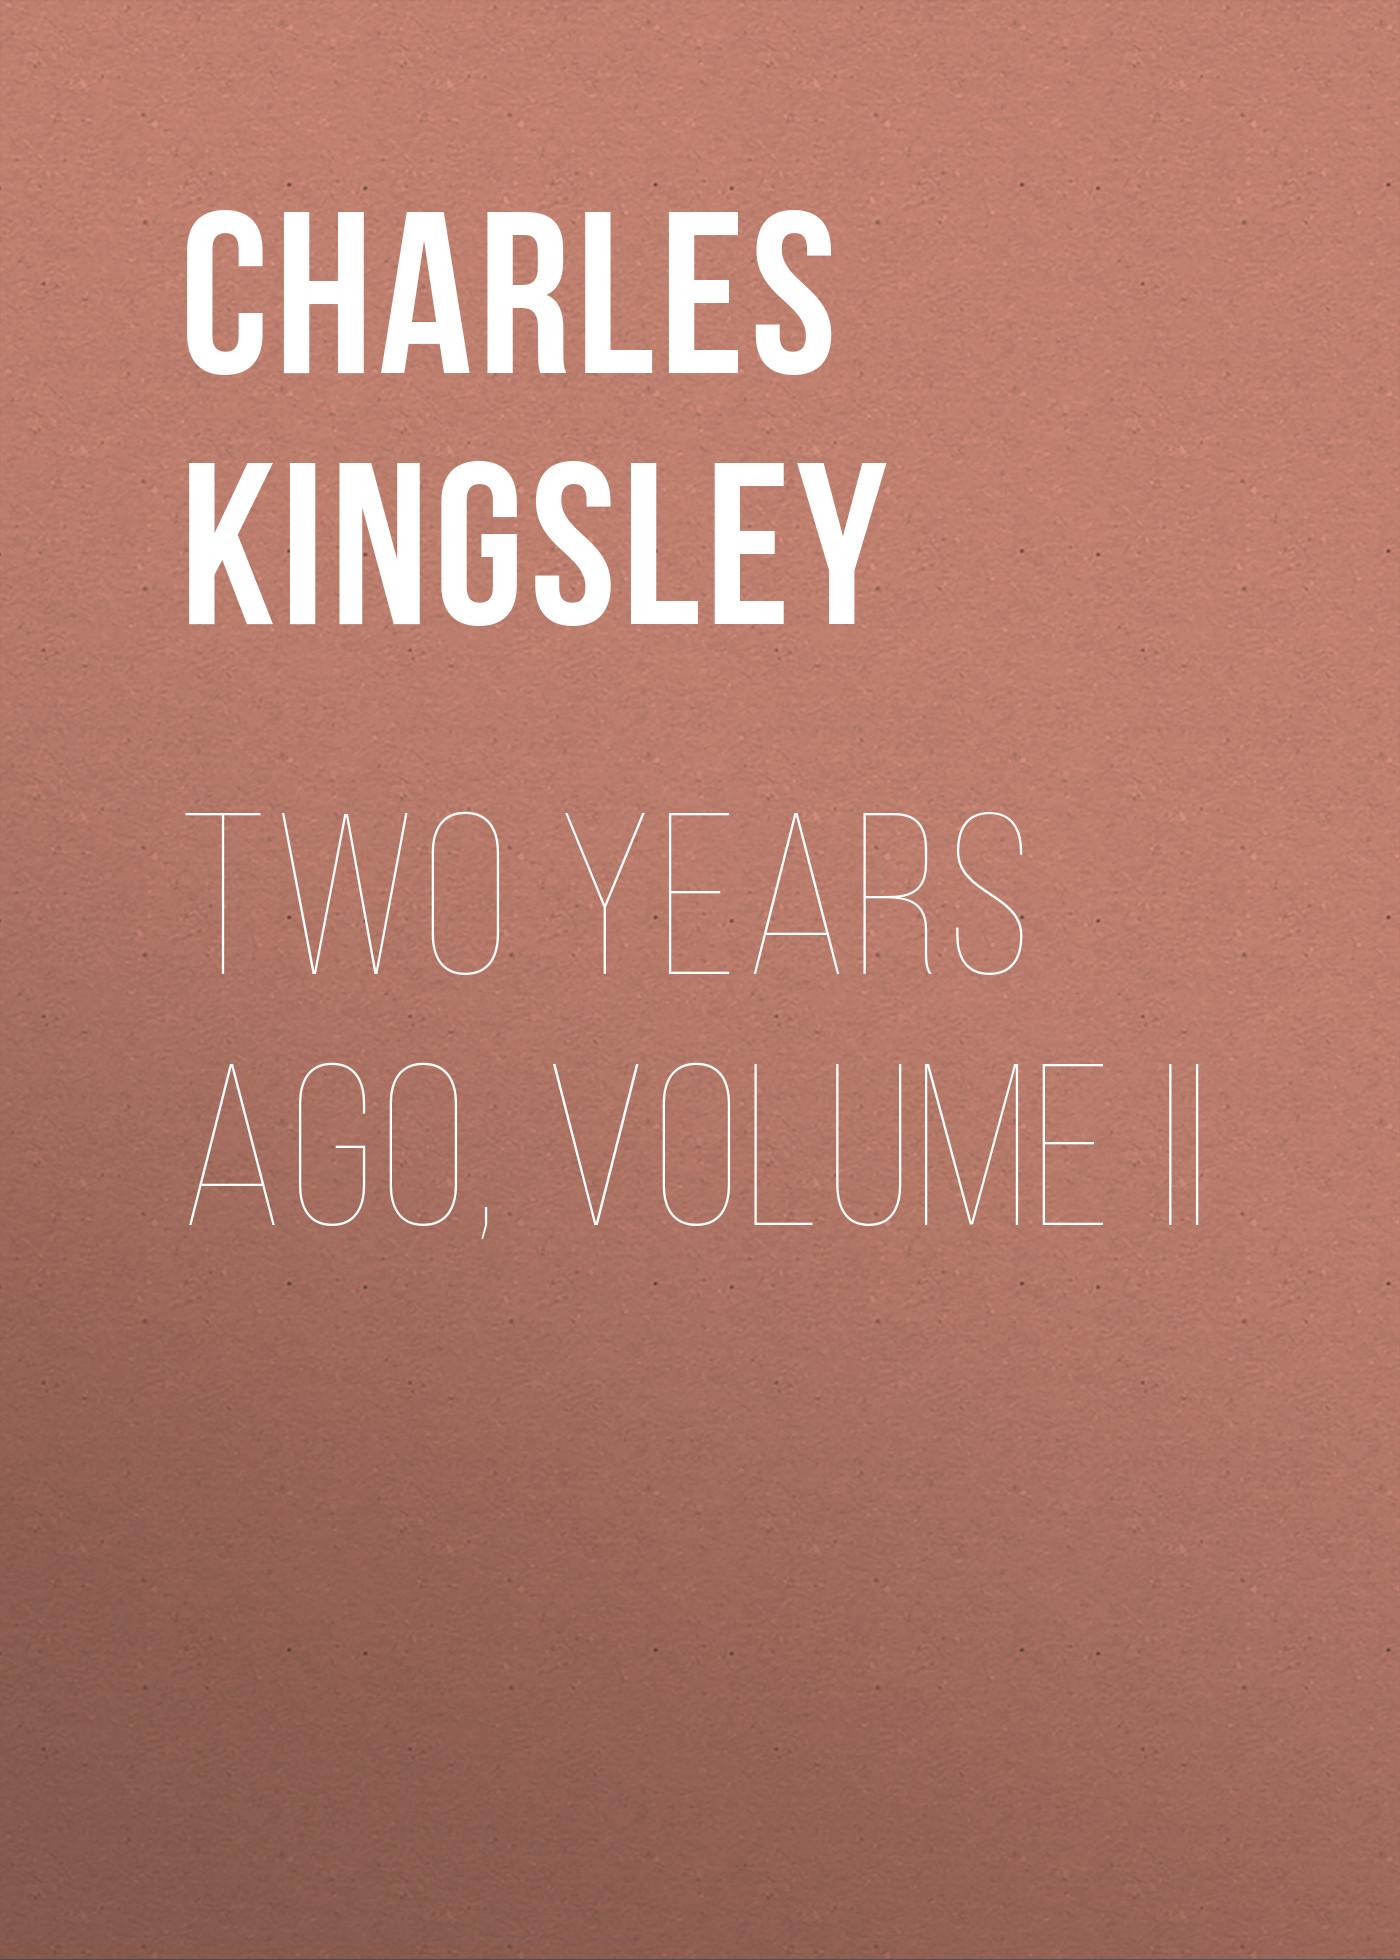 Two Years Ago, Volume II